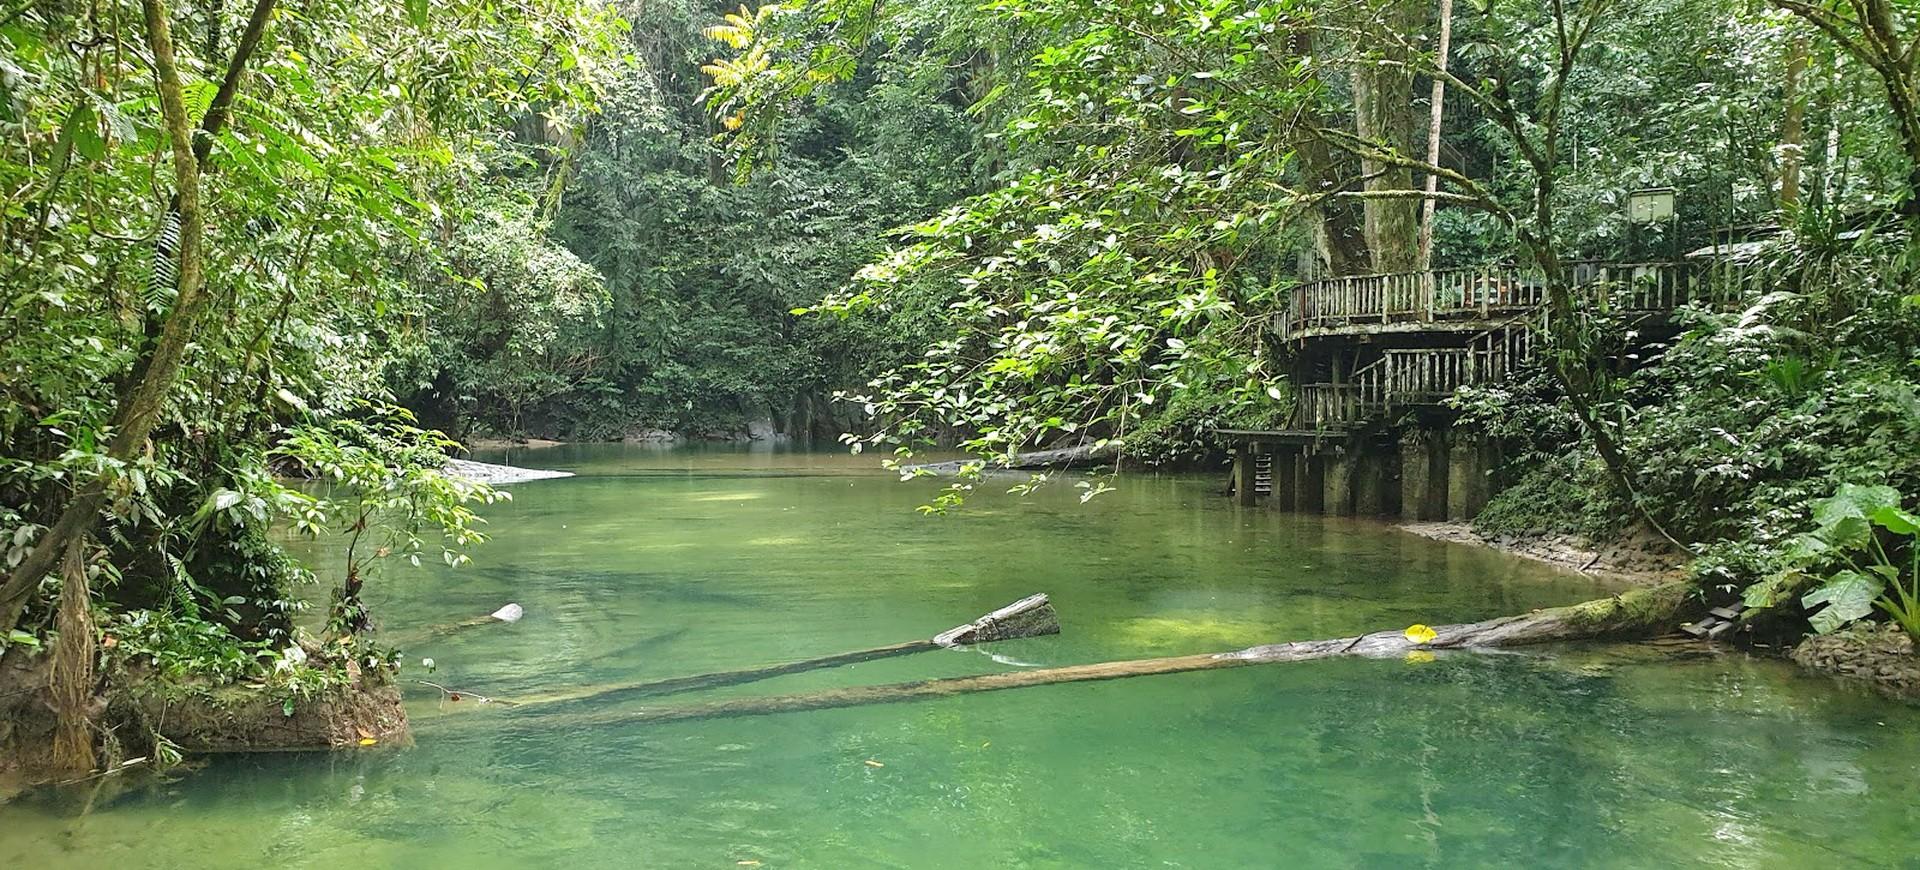 Malaisie Parc National du Gunung Mulu